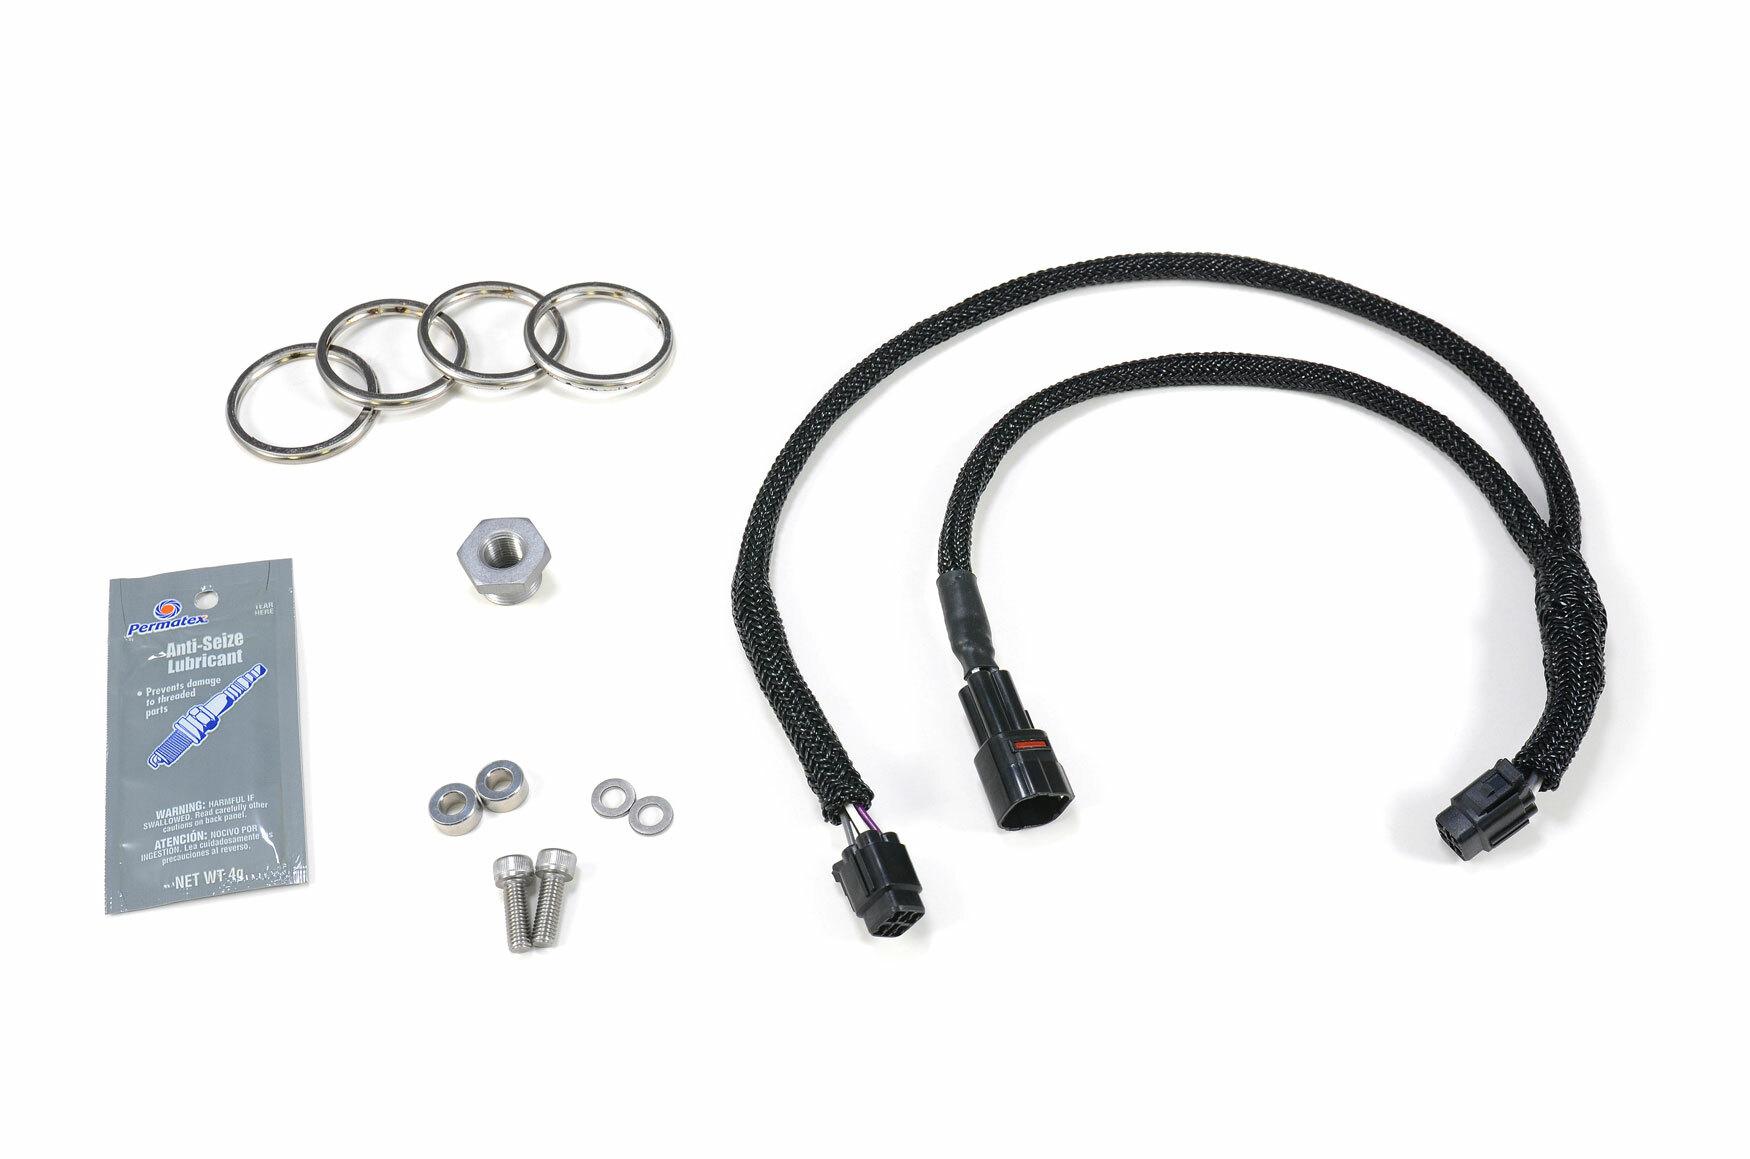 Suzuki Hayabusa Gen 2 to Gen 3 Full Exhaust Adapter Kit